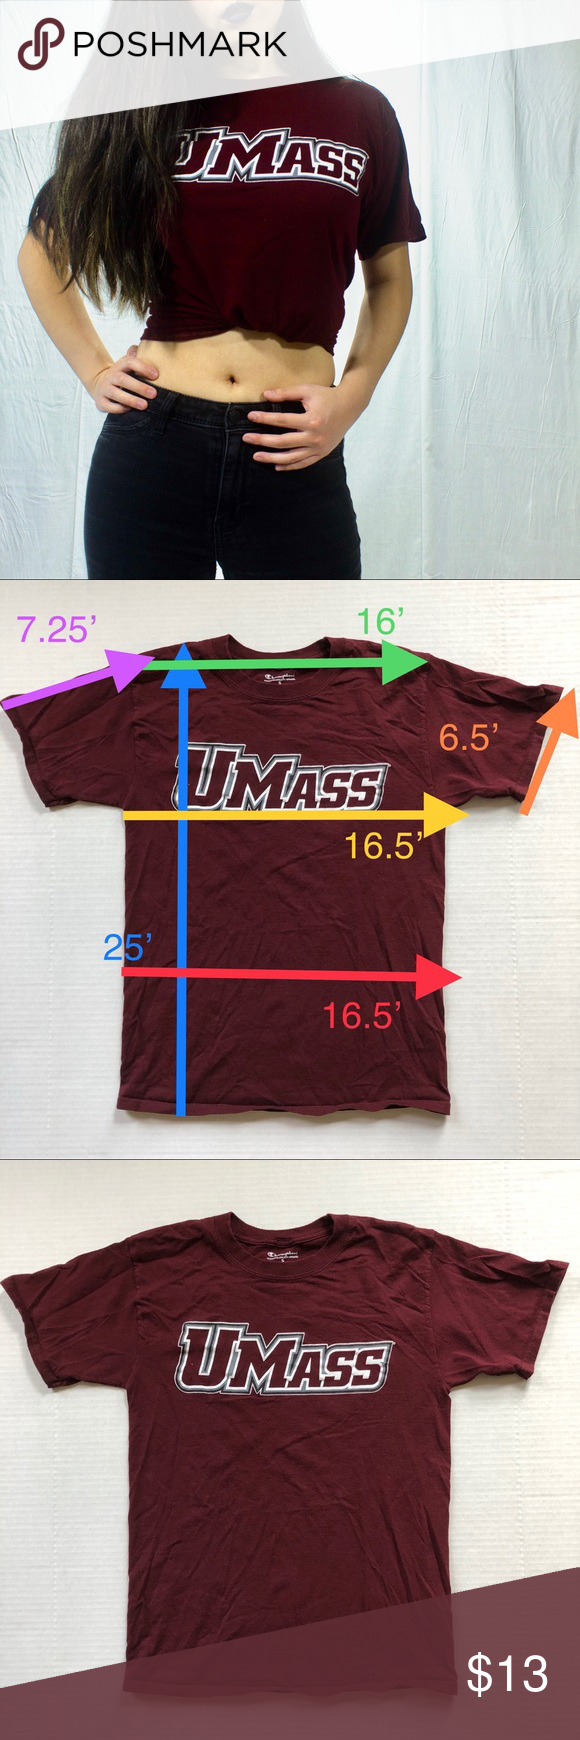 Umass Amherst T Shirt Shirts Champion Tops Clothes Design